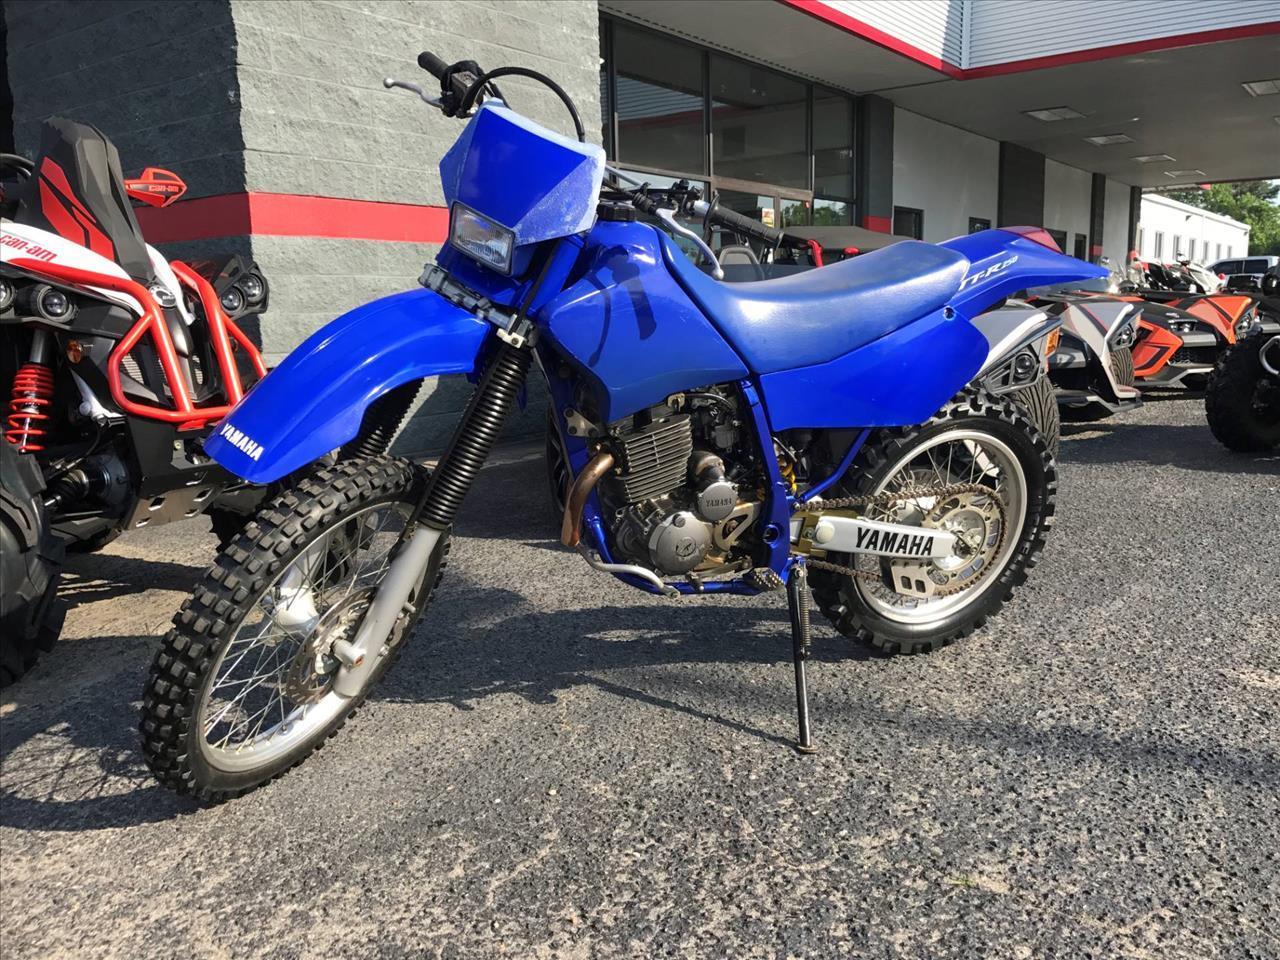 2005 Yamaha TT-R250 for sale at Vehicle Network, LLC - Performance East, INC. in Goldsboro NC